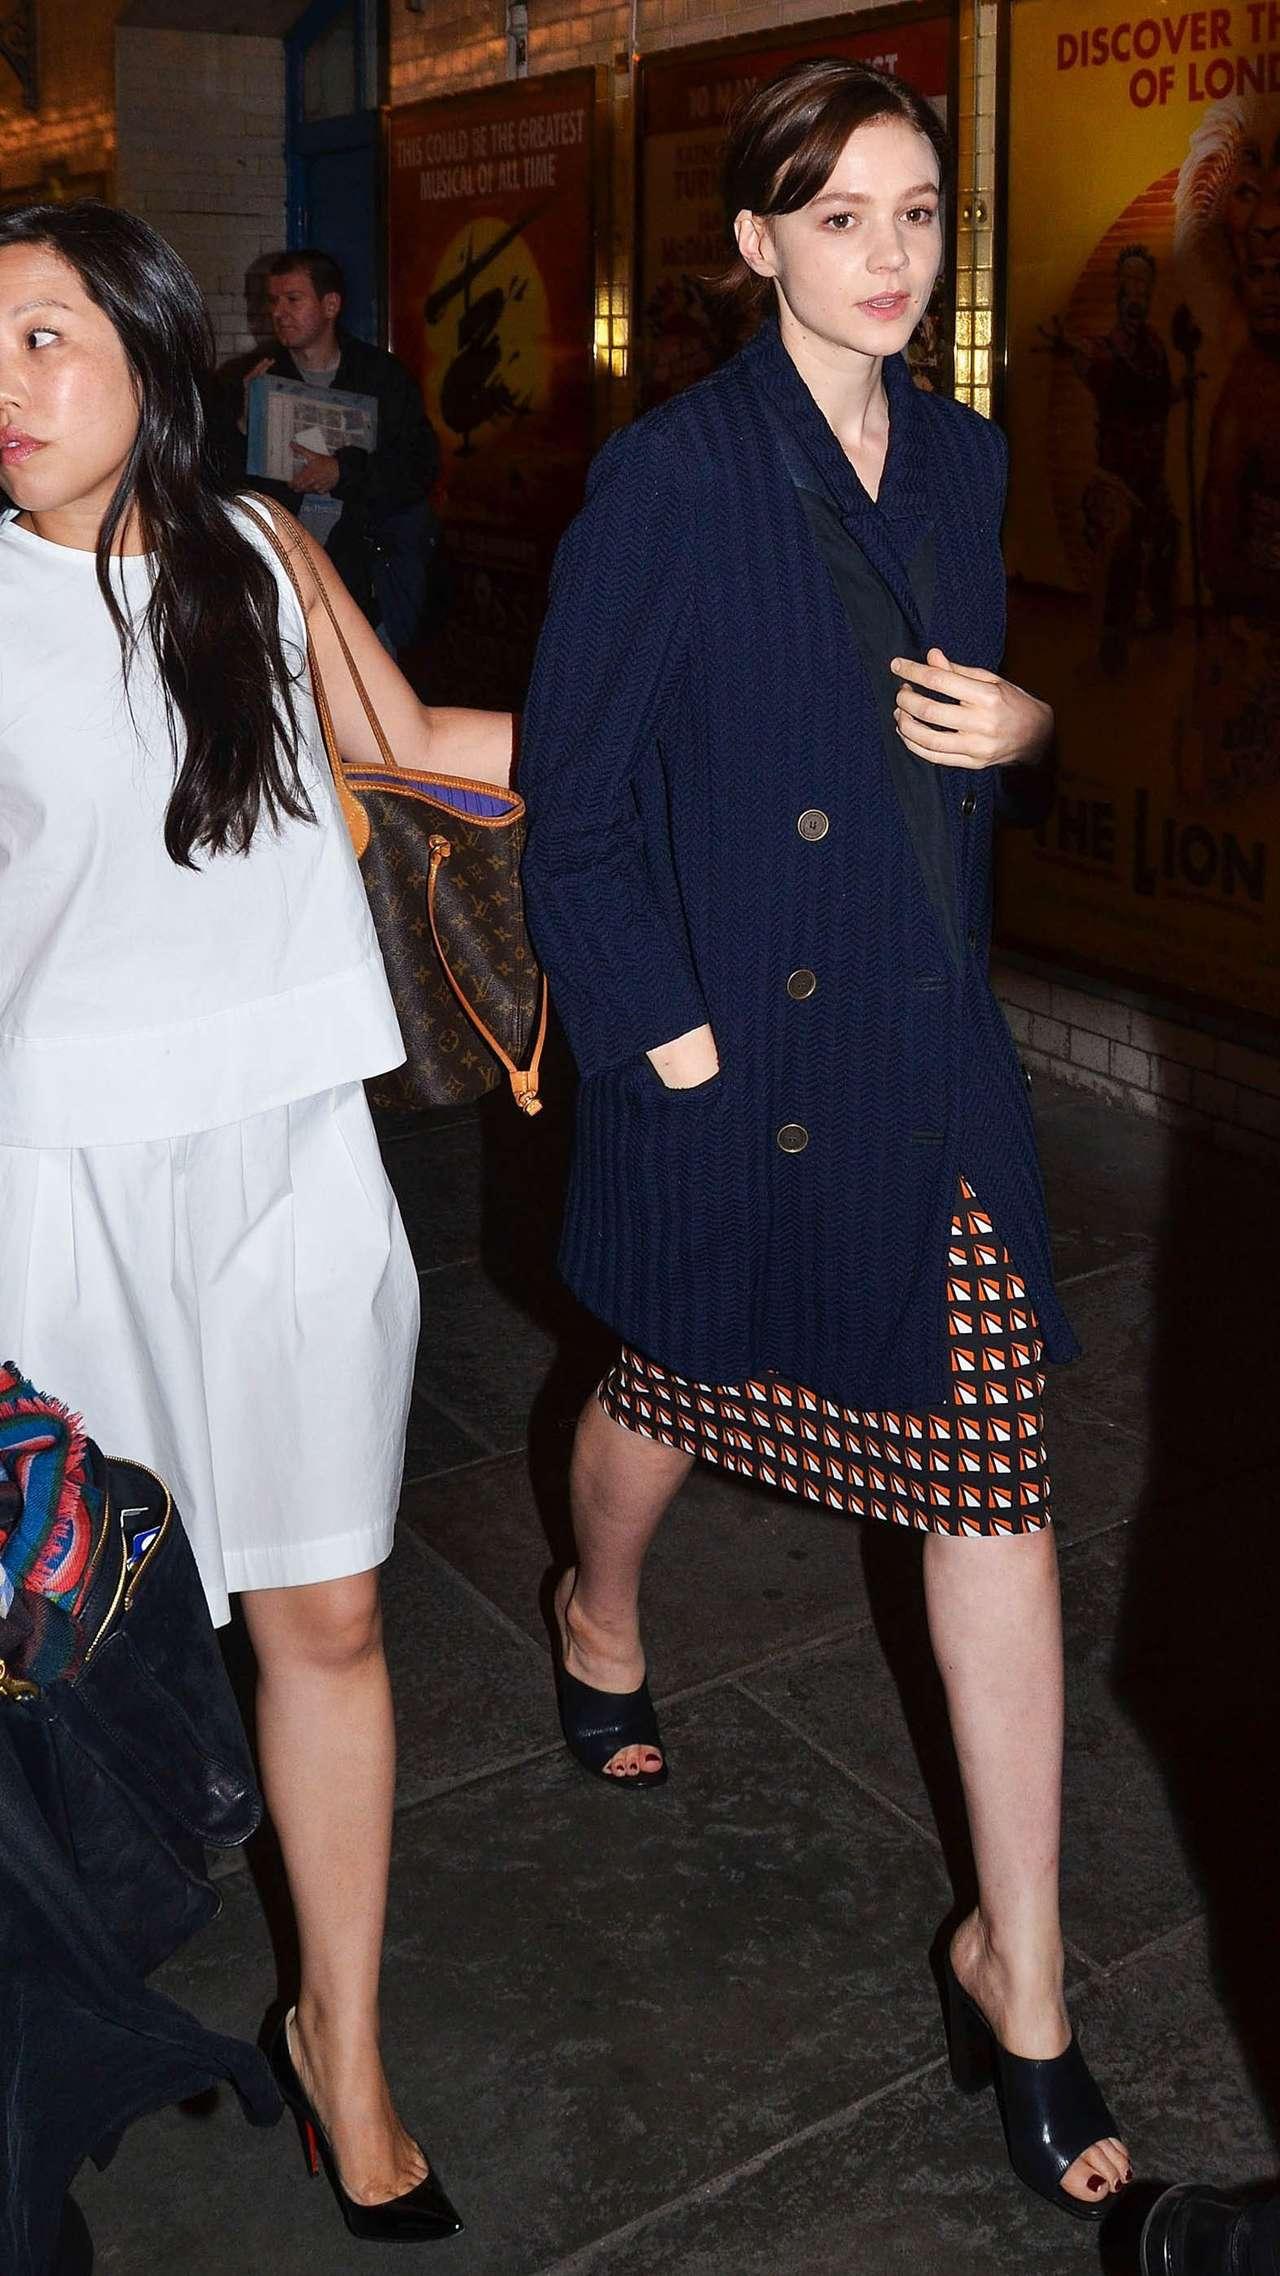 Carey Mulligan 2014 : Carey Mulligan arriving at Skylight press night -01